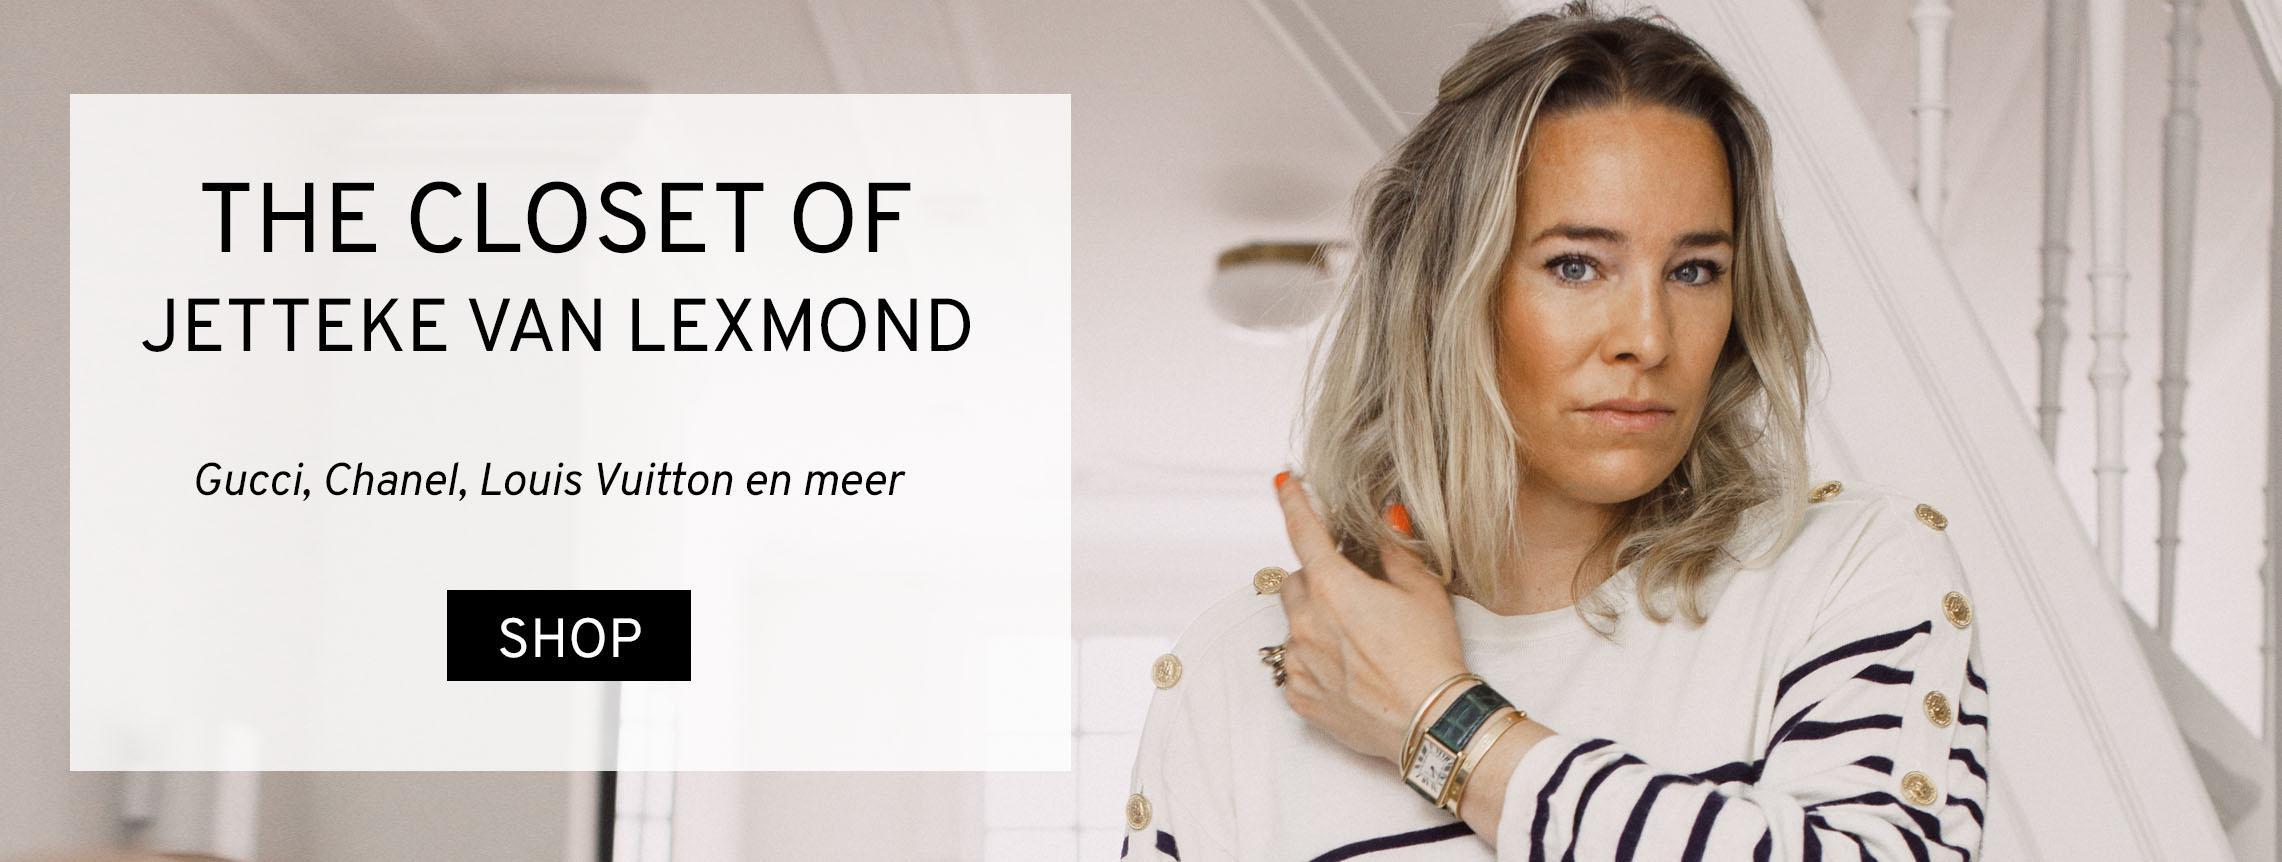 Tweedehands_merkkleding-Closet_of_Jetteke_van_Lexmond_The-Next-Closet